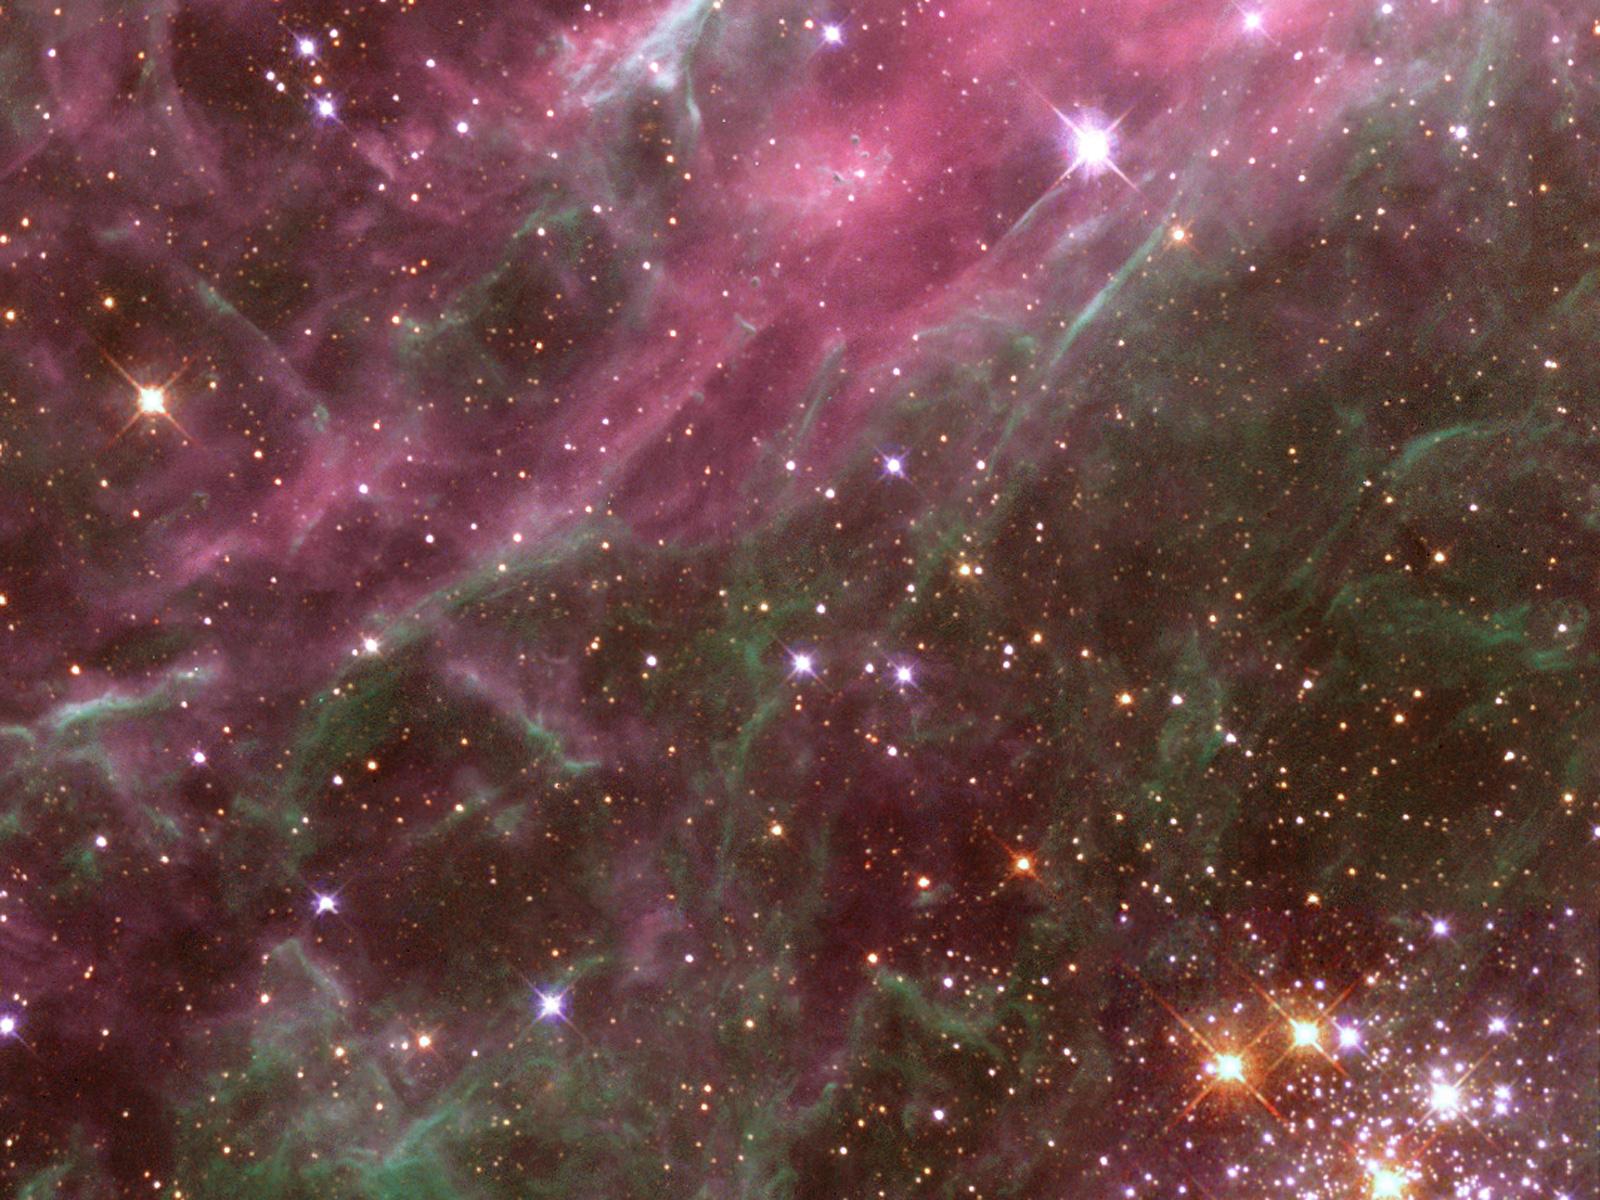 Space hubble wallpaper